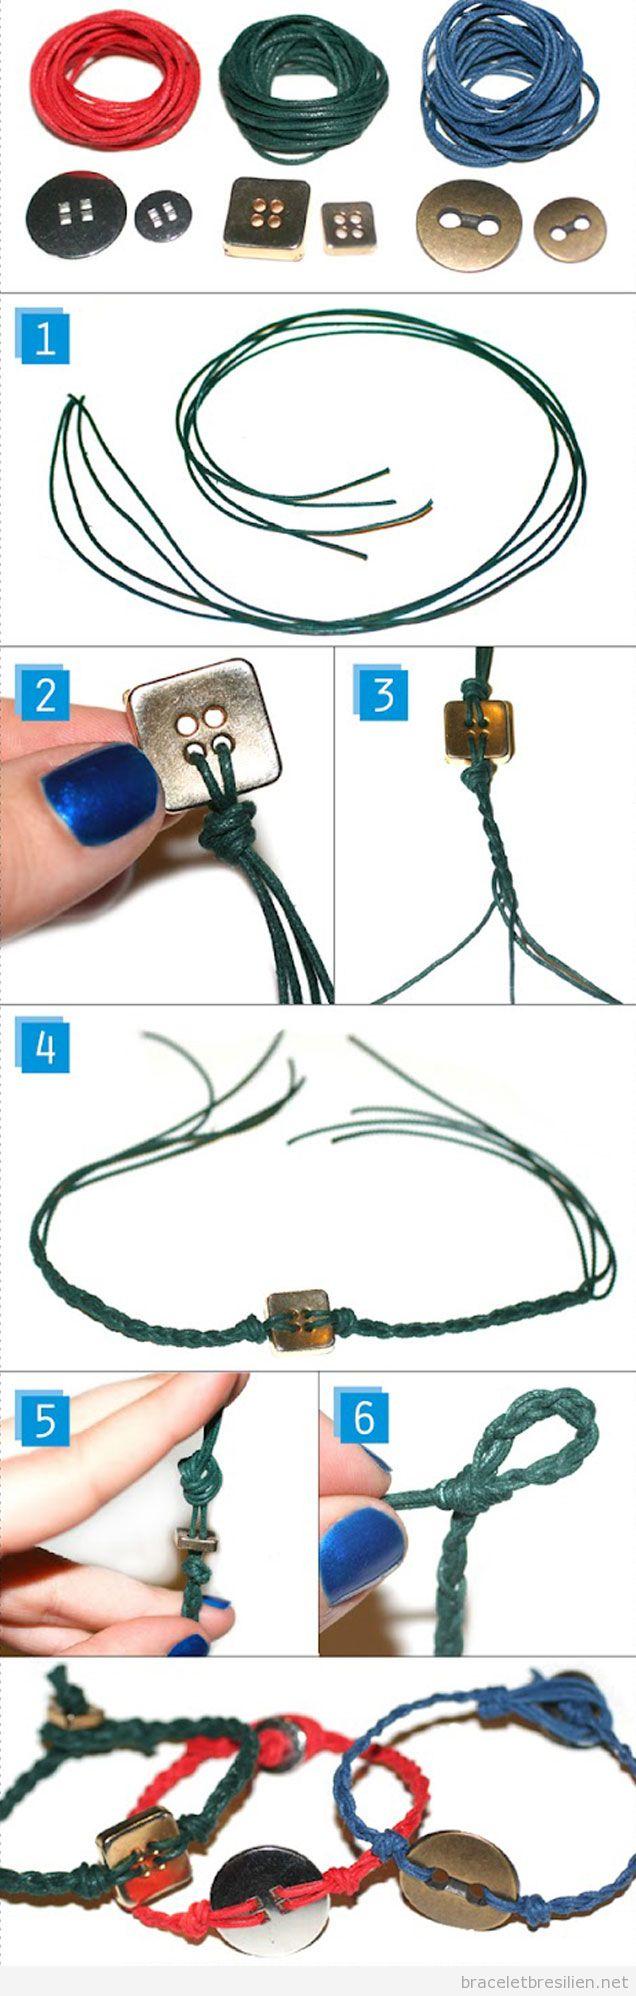 Tuto bracelet DIY, fil en cuir et boutons